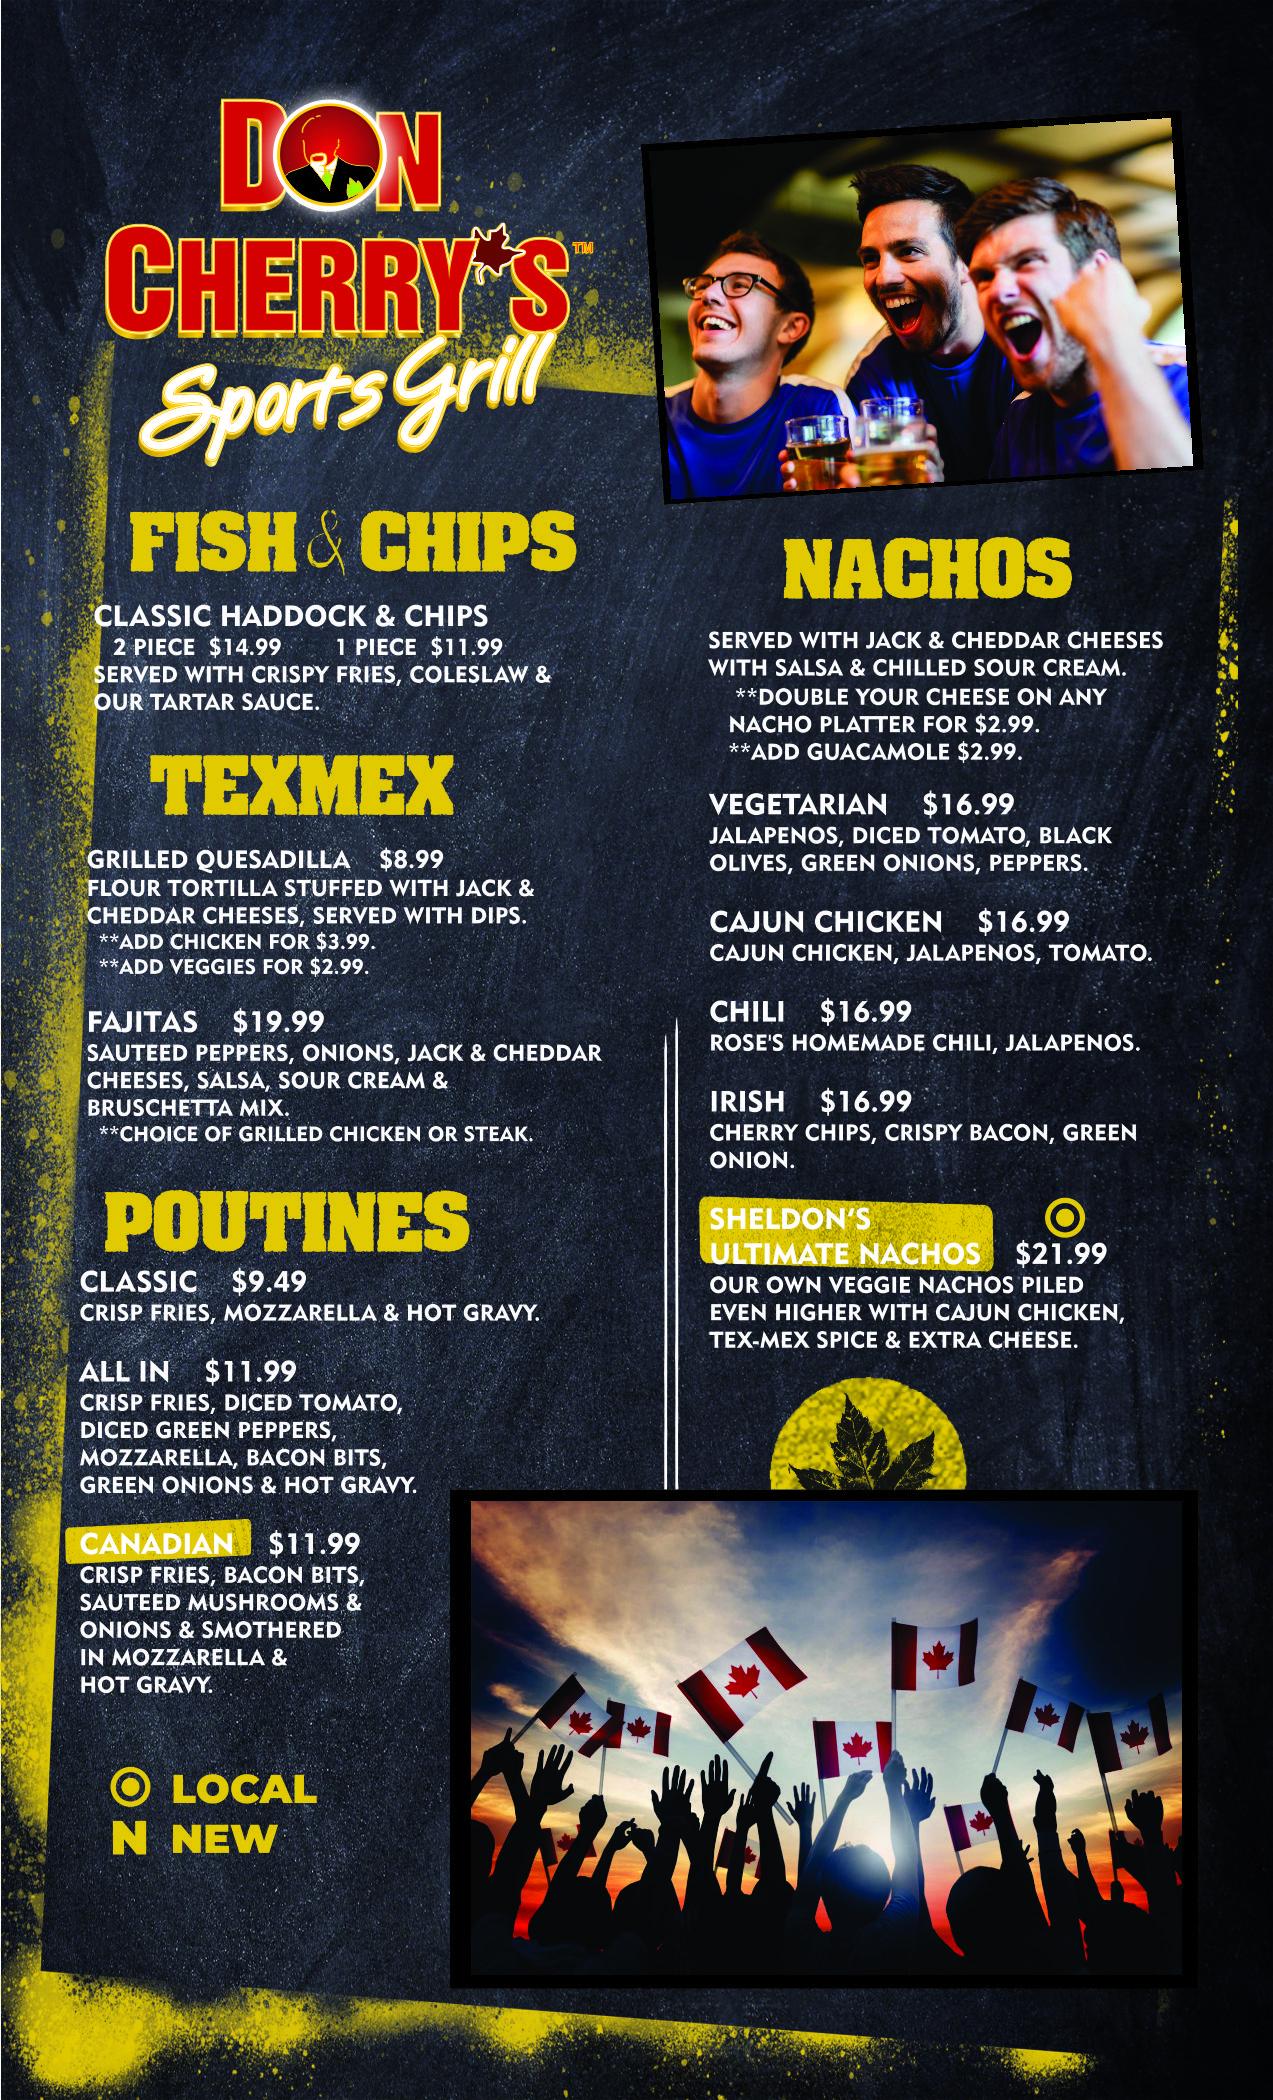 fish-texmex-poutine-nachos